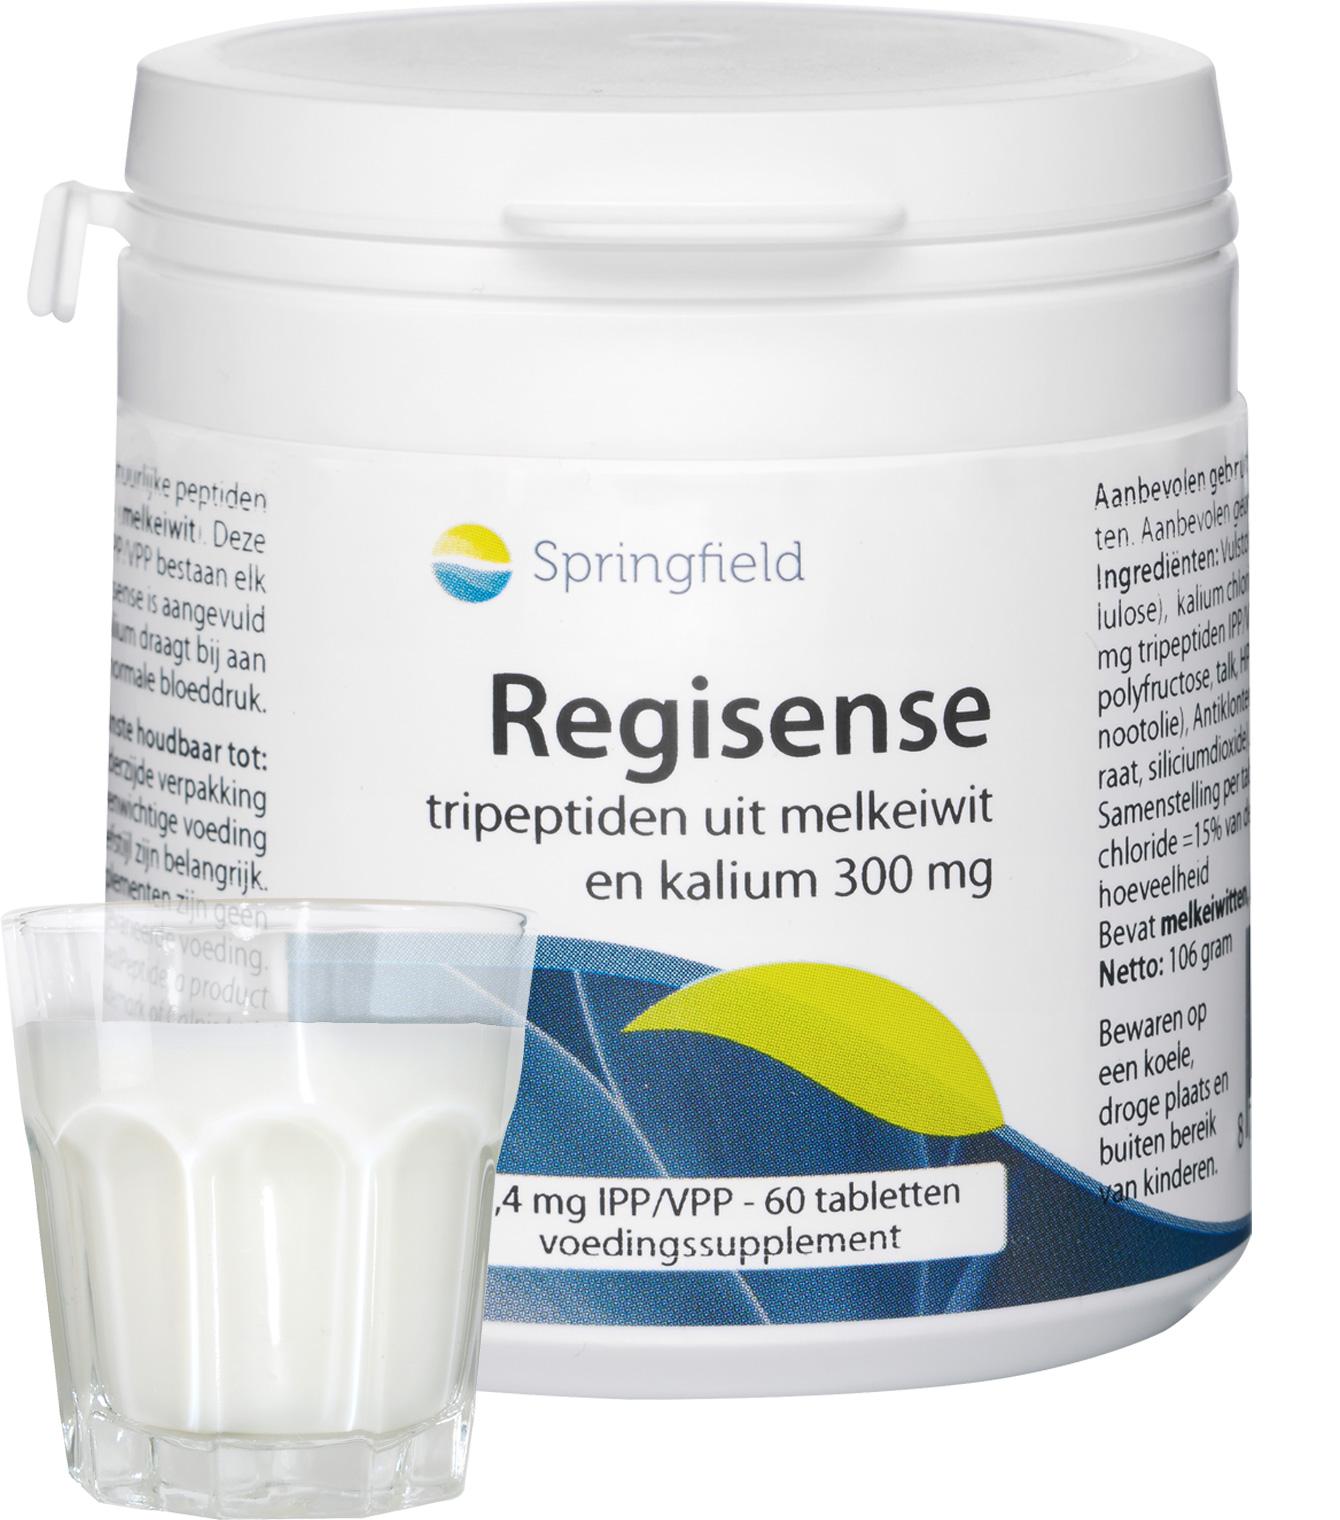 Regisense - Tripeptiden IPP/VPP 3,4 mg uit melkeiwit en 300 mg kalium